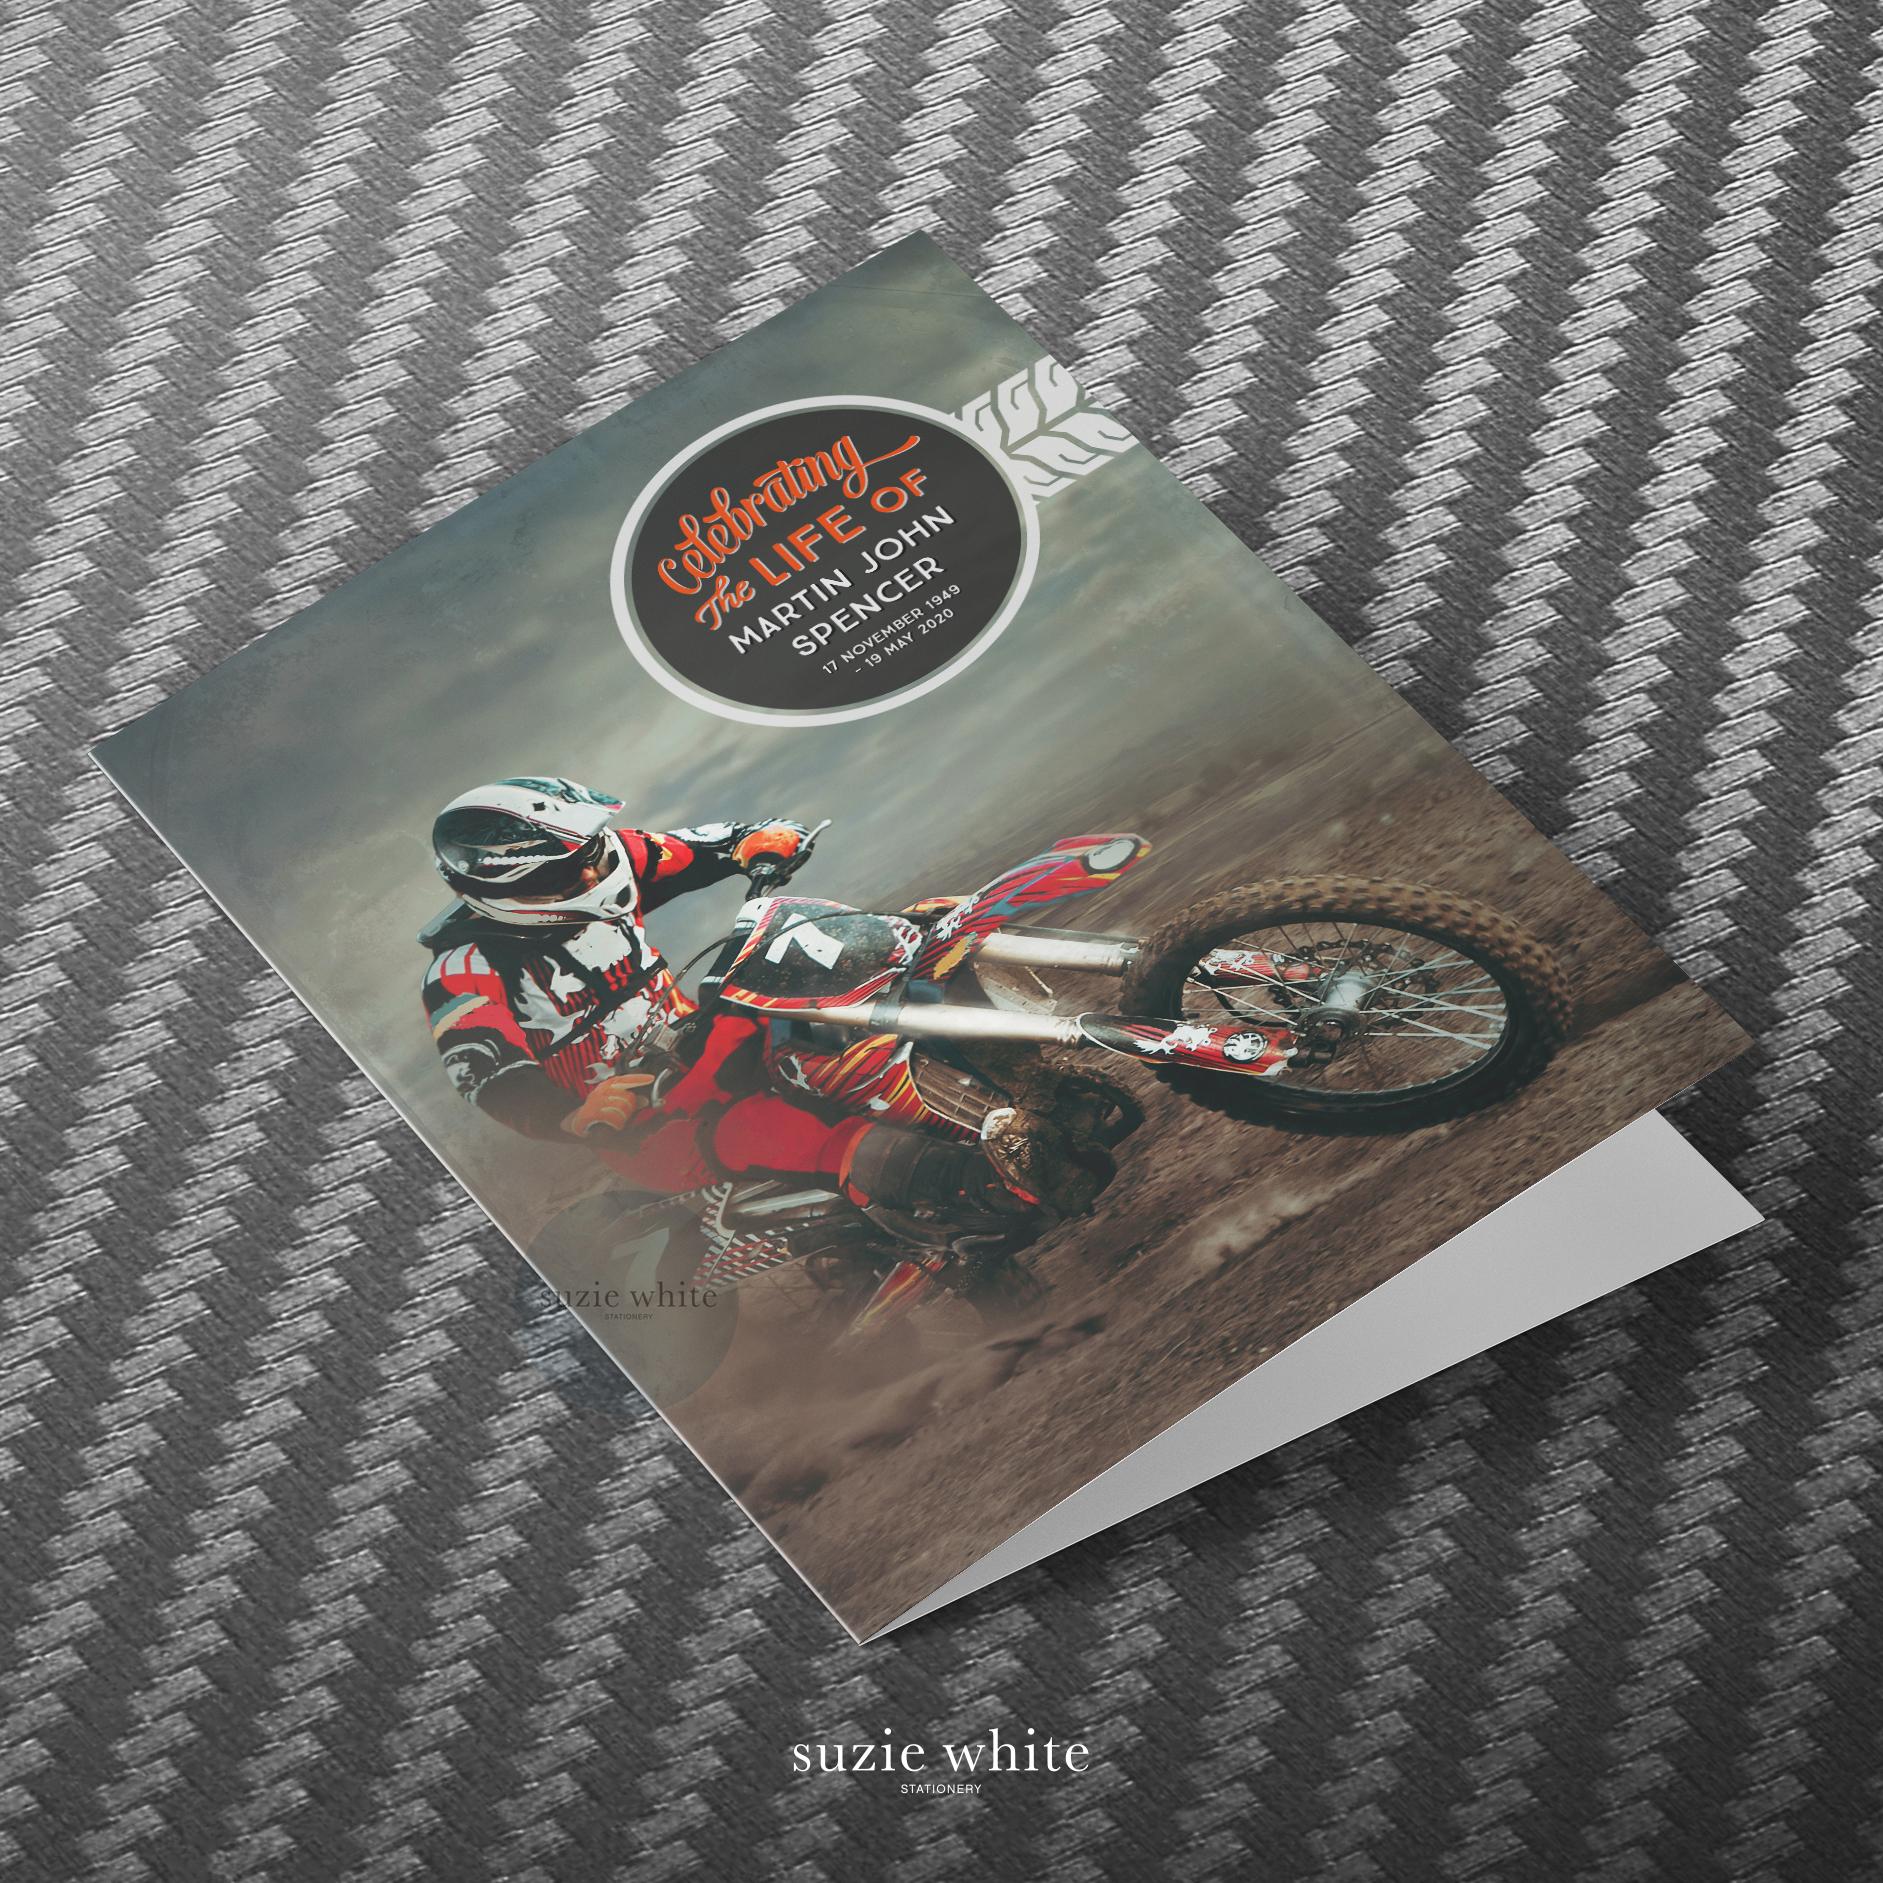 Motorbike funeral order of service. Motorcycle funeral stationery. Motorcycle theme funeral.